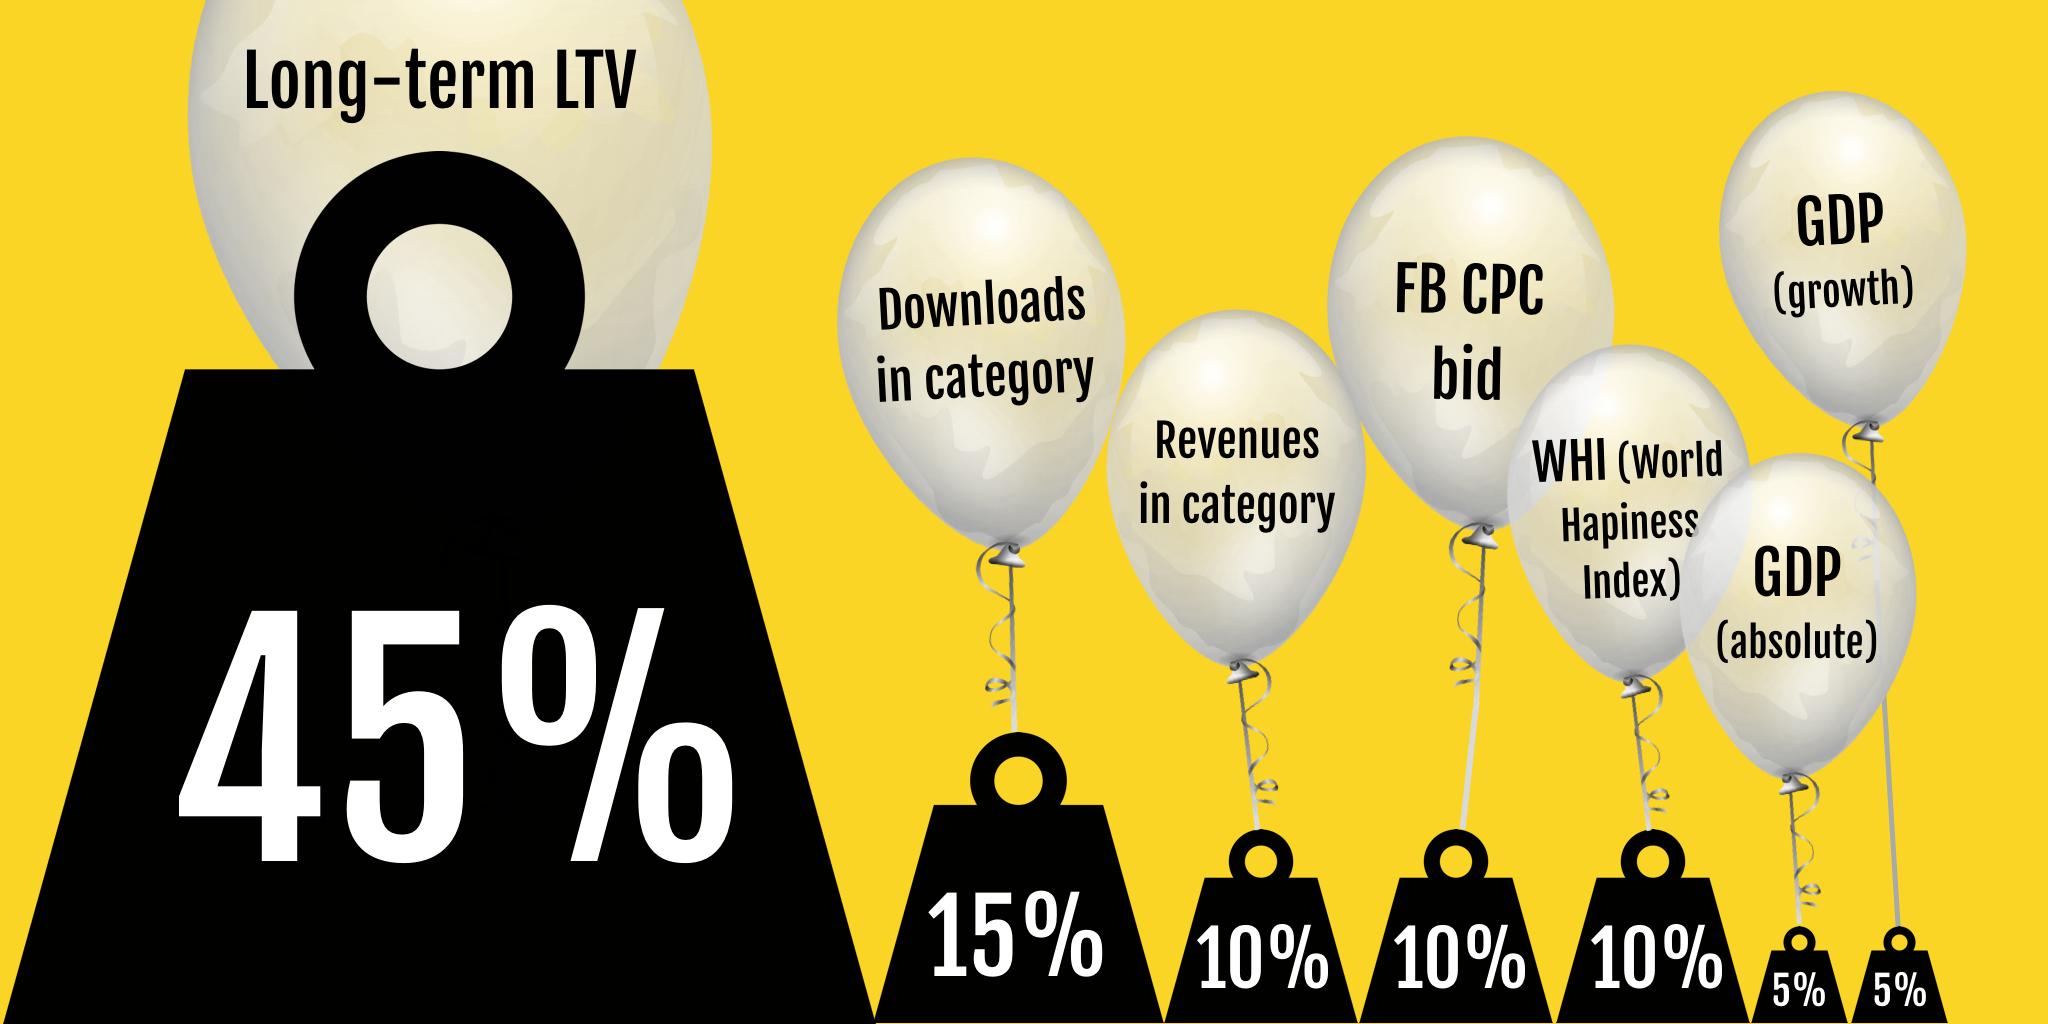 long-term LTV